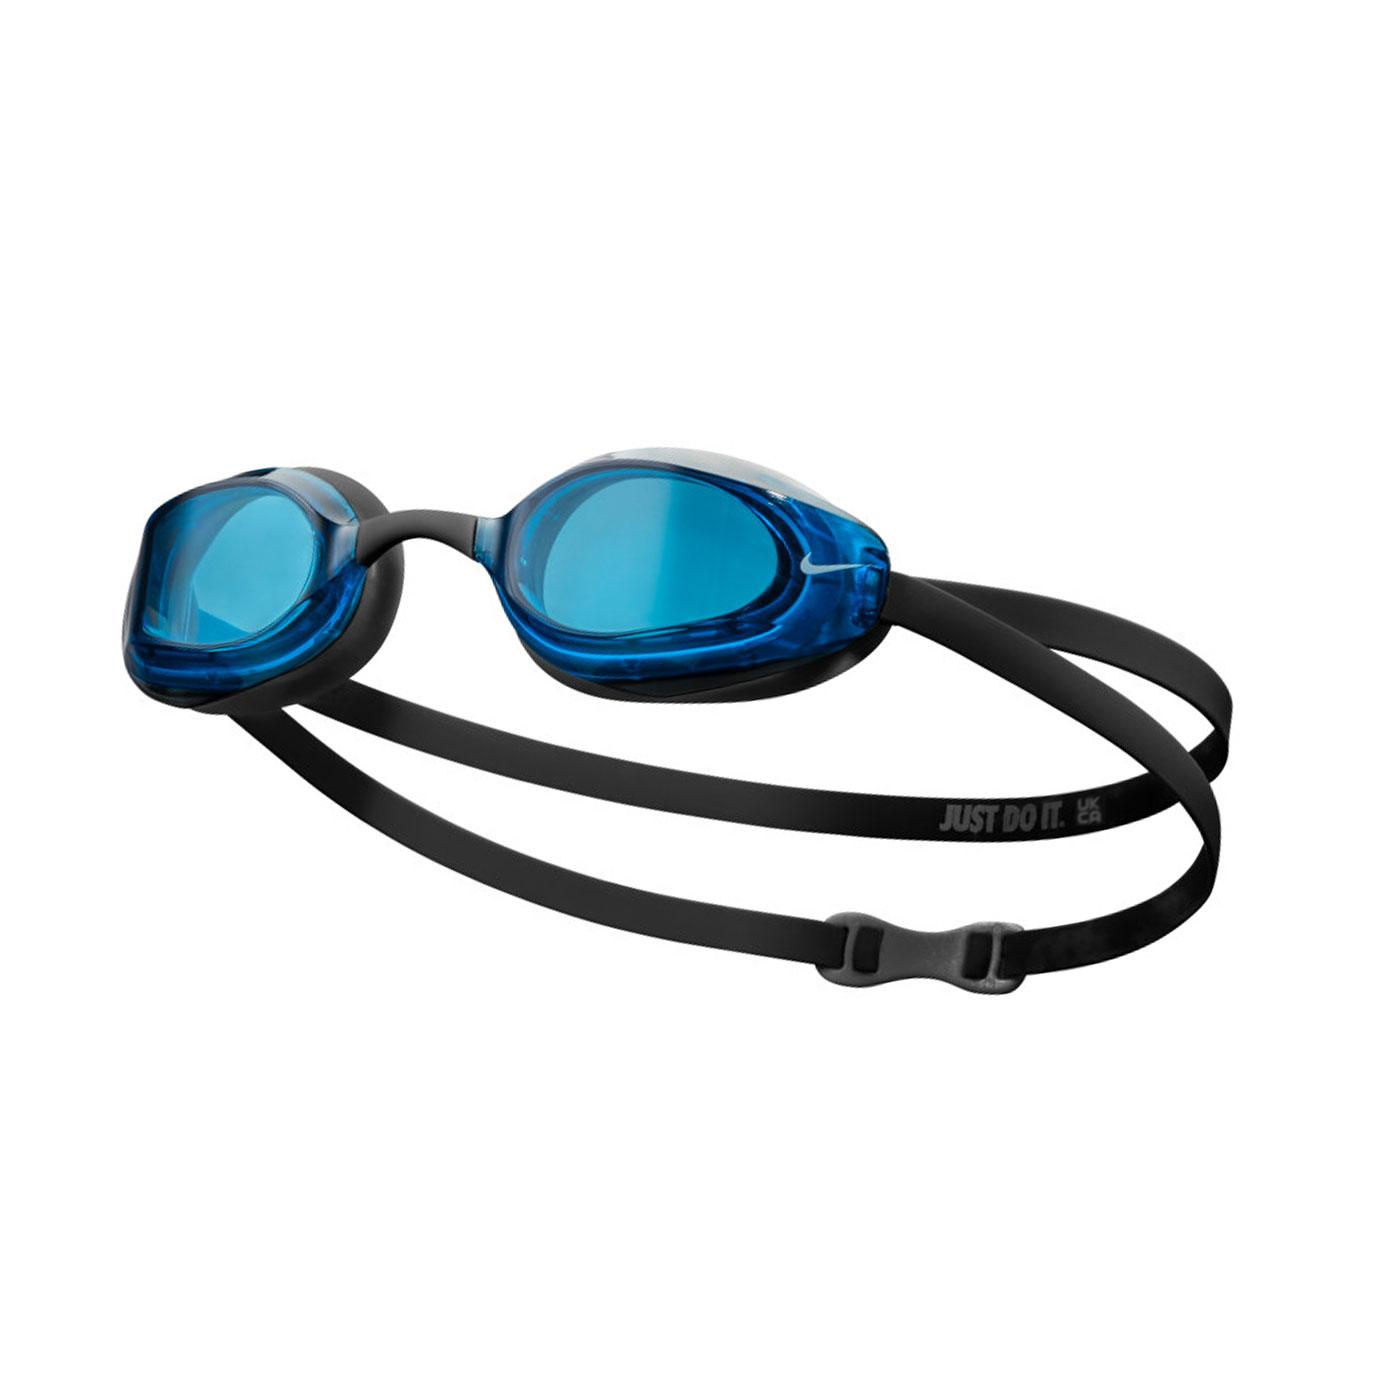 NIKE 成人專業型泳鏡 NESSA177-400 - 黑藍